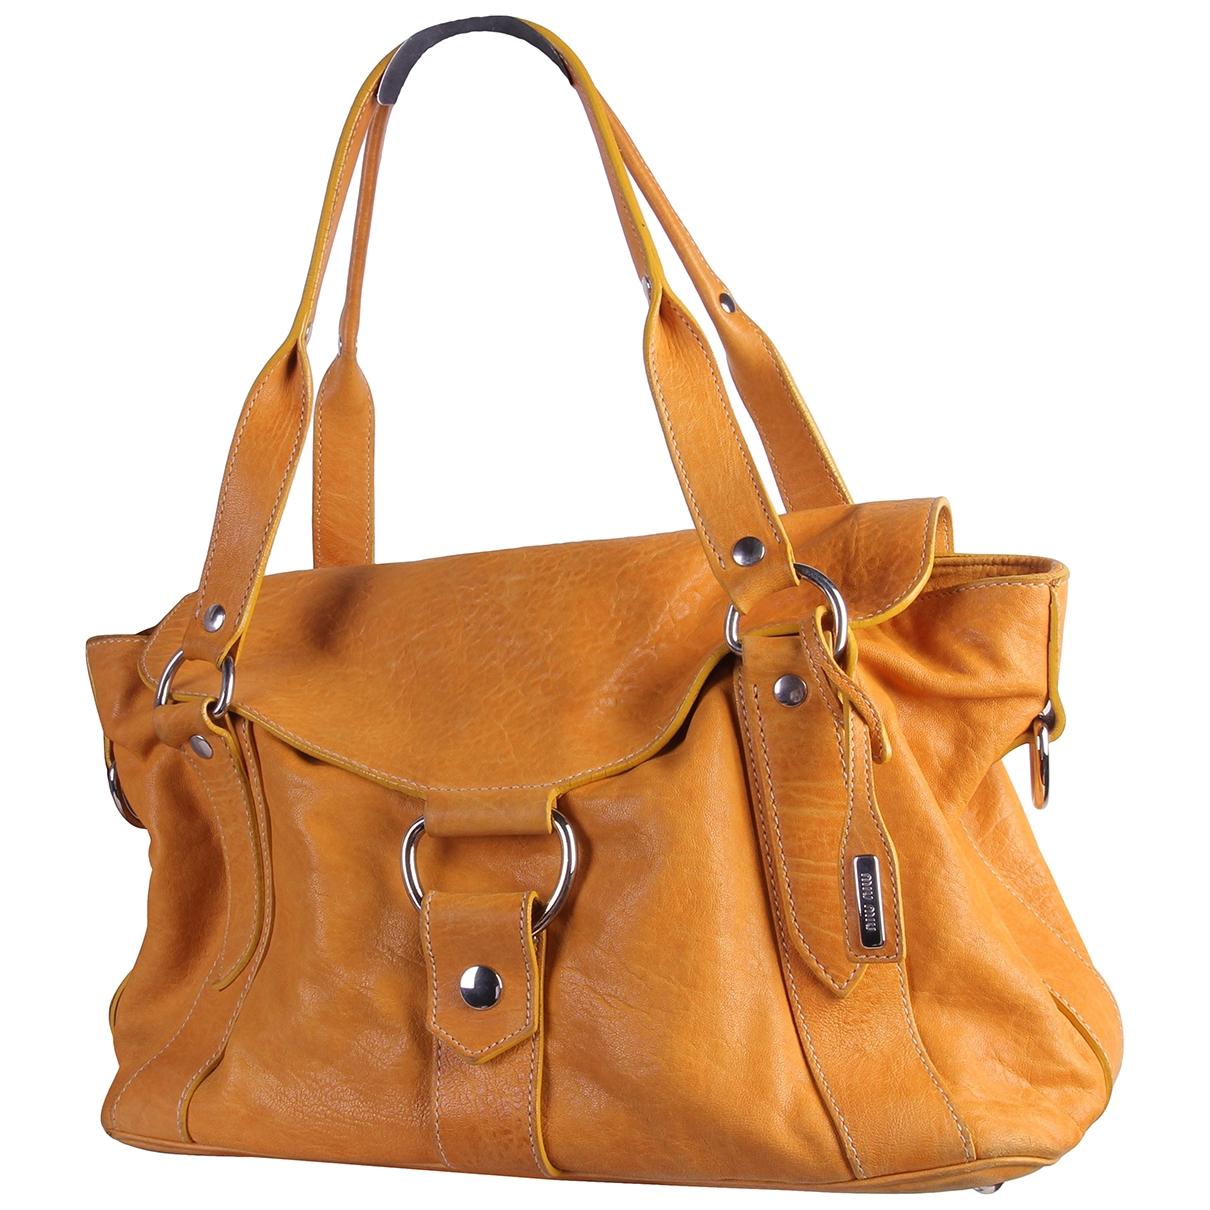 Miu Miu \N Yellow Leather handbag for Women \N